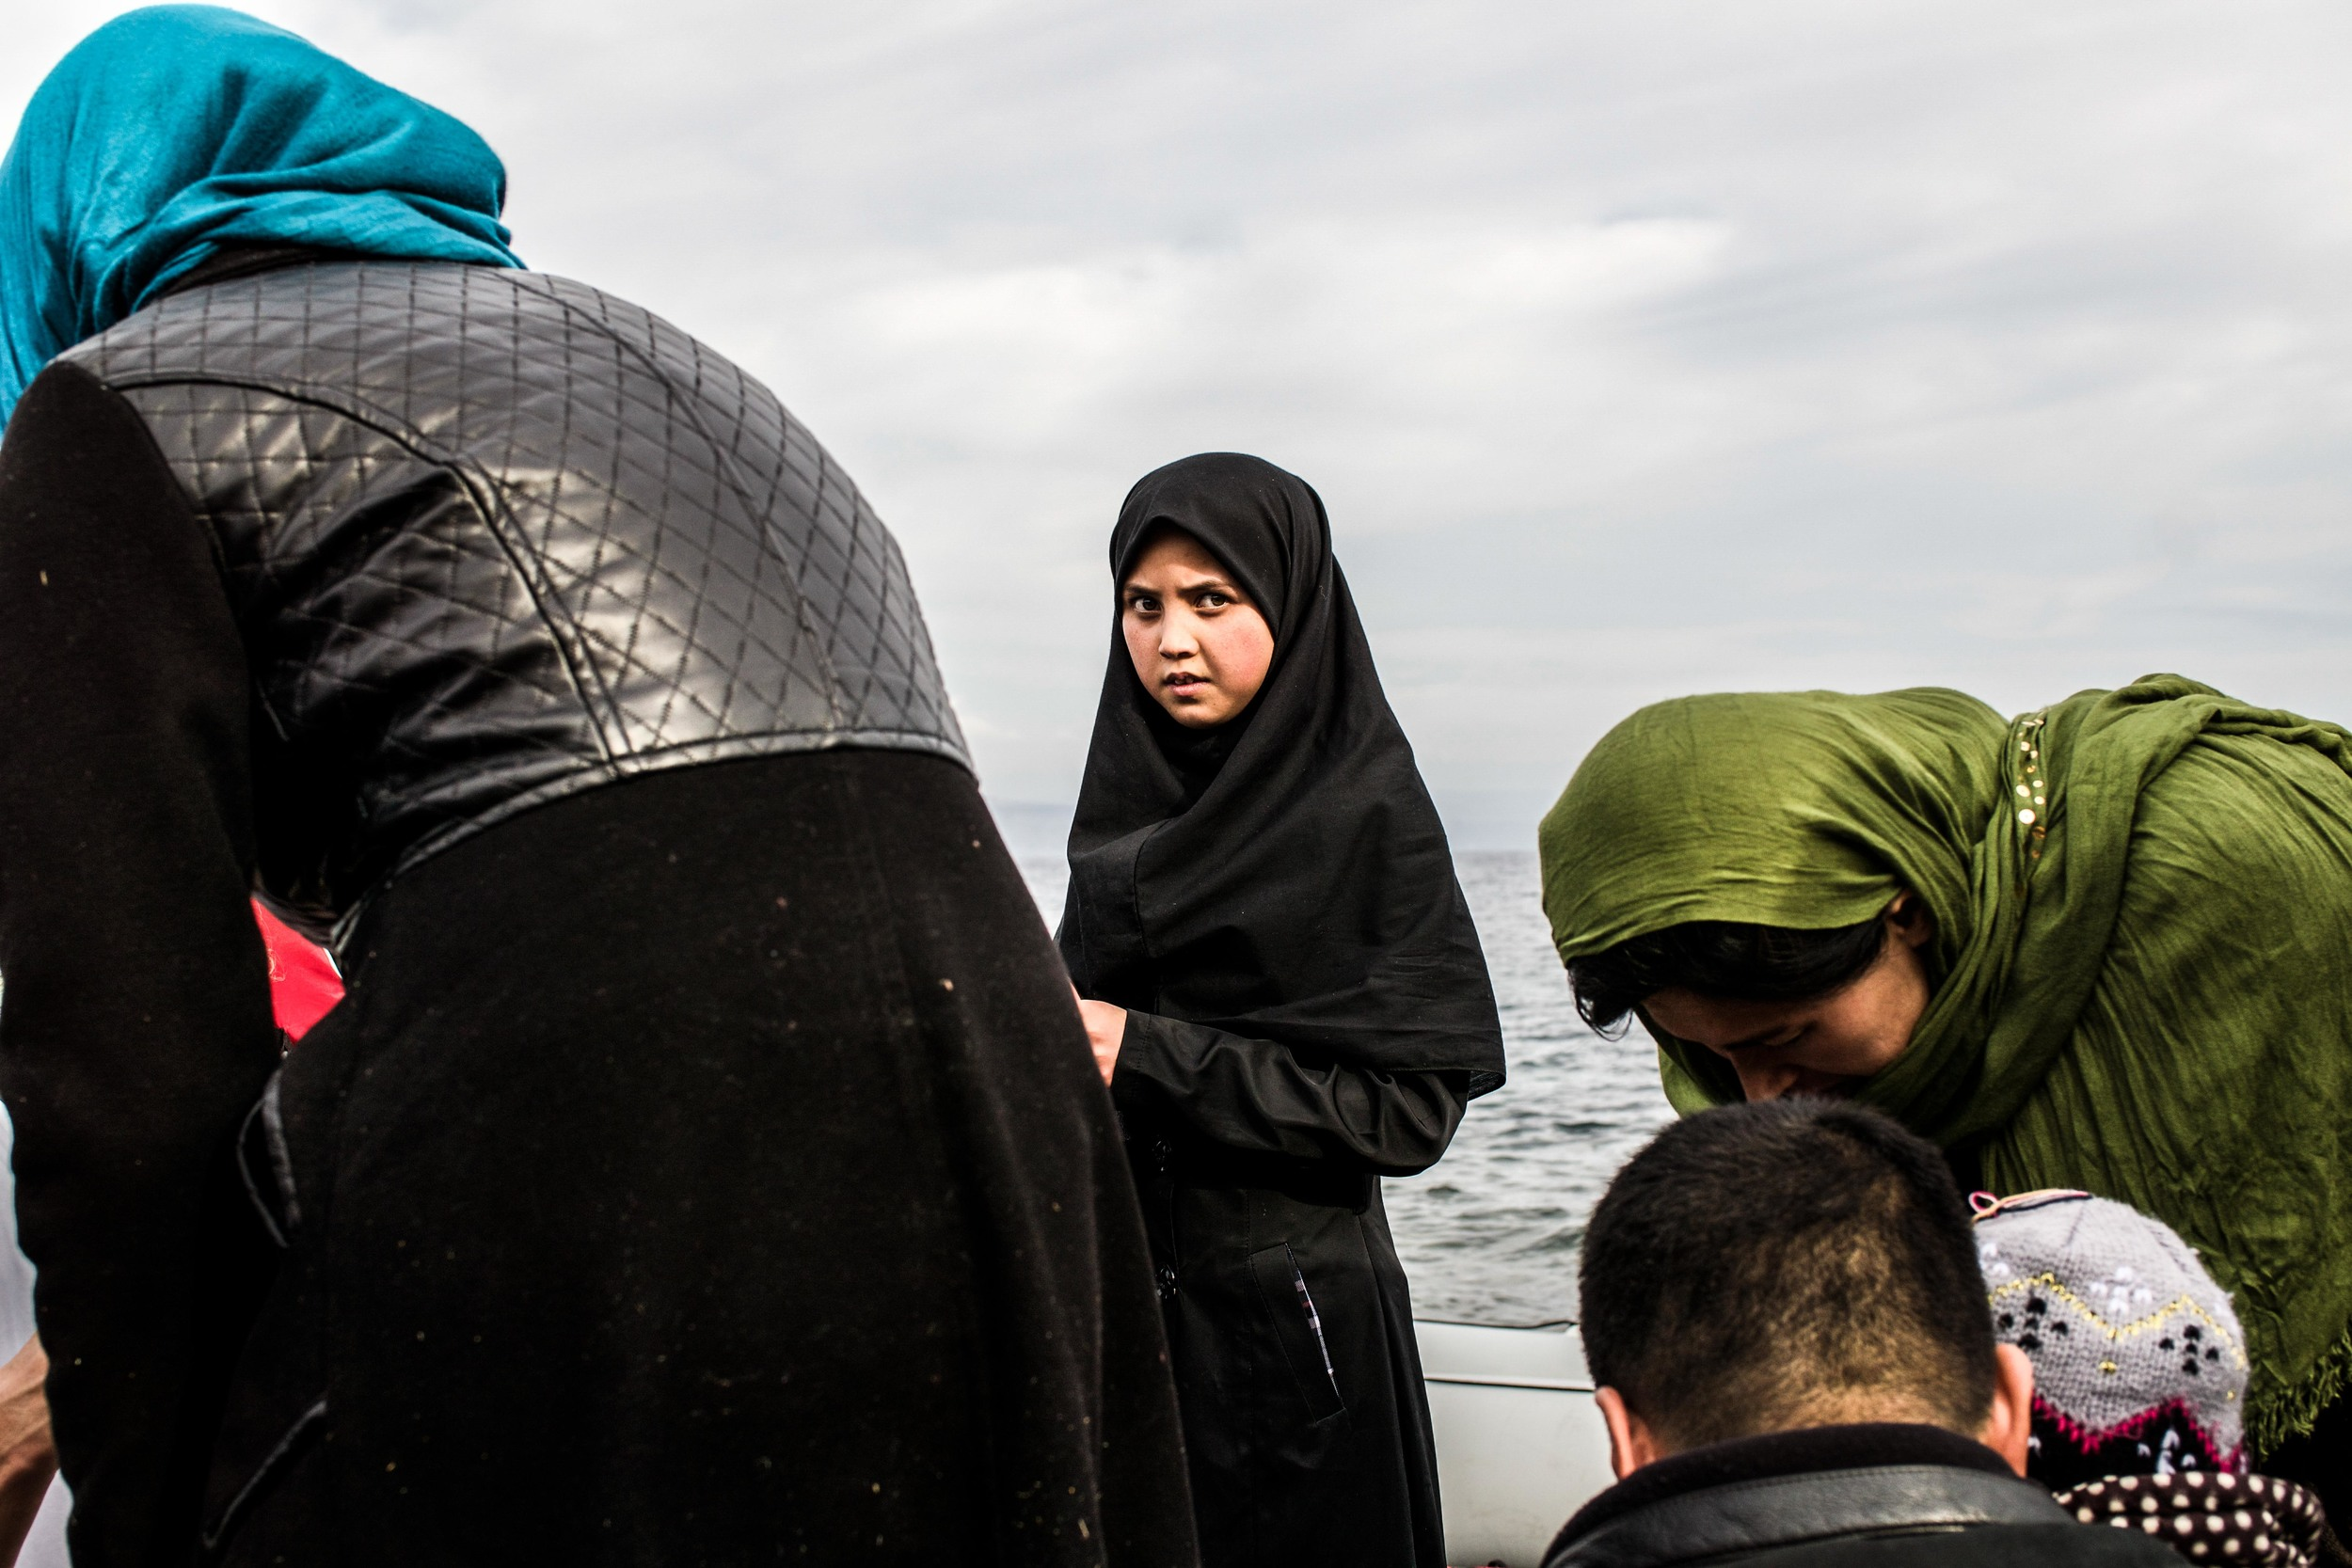 Syrian Refugee Crisis Lesbos Greece November 2015 5.jpg